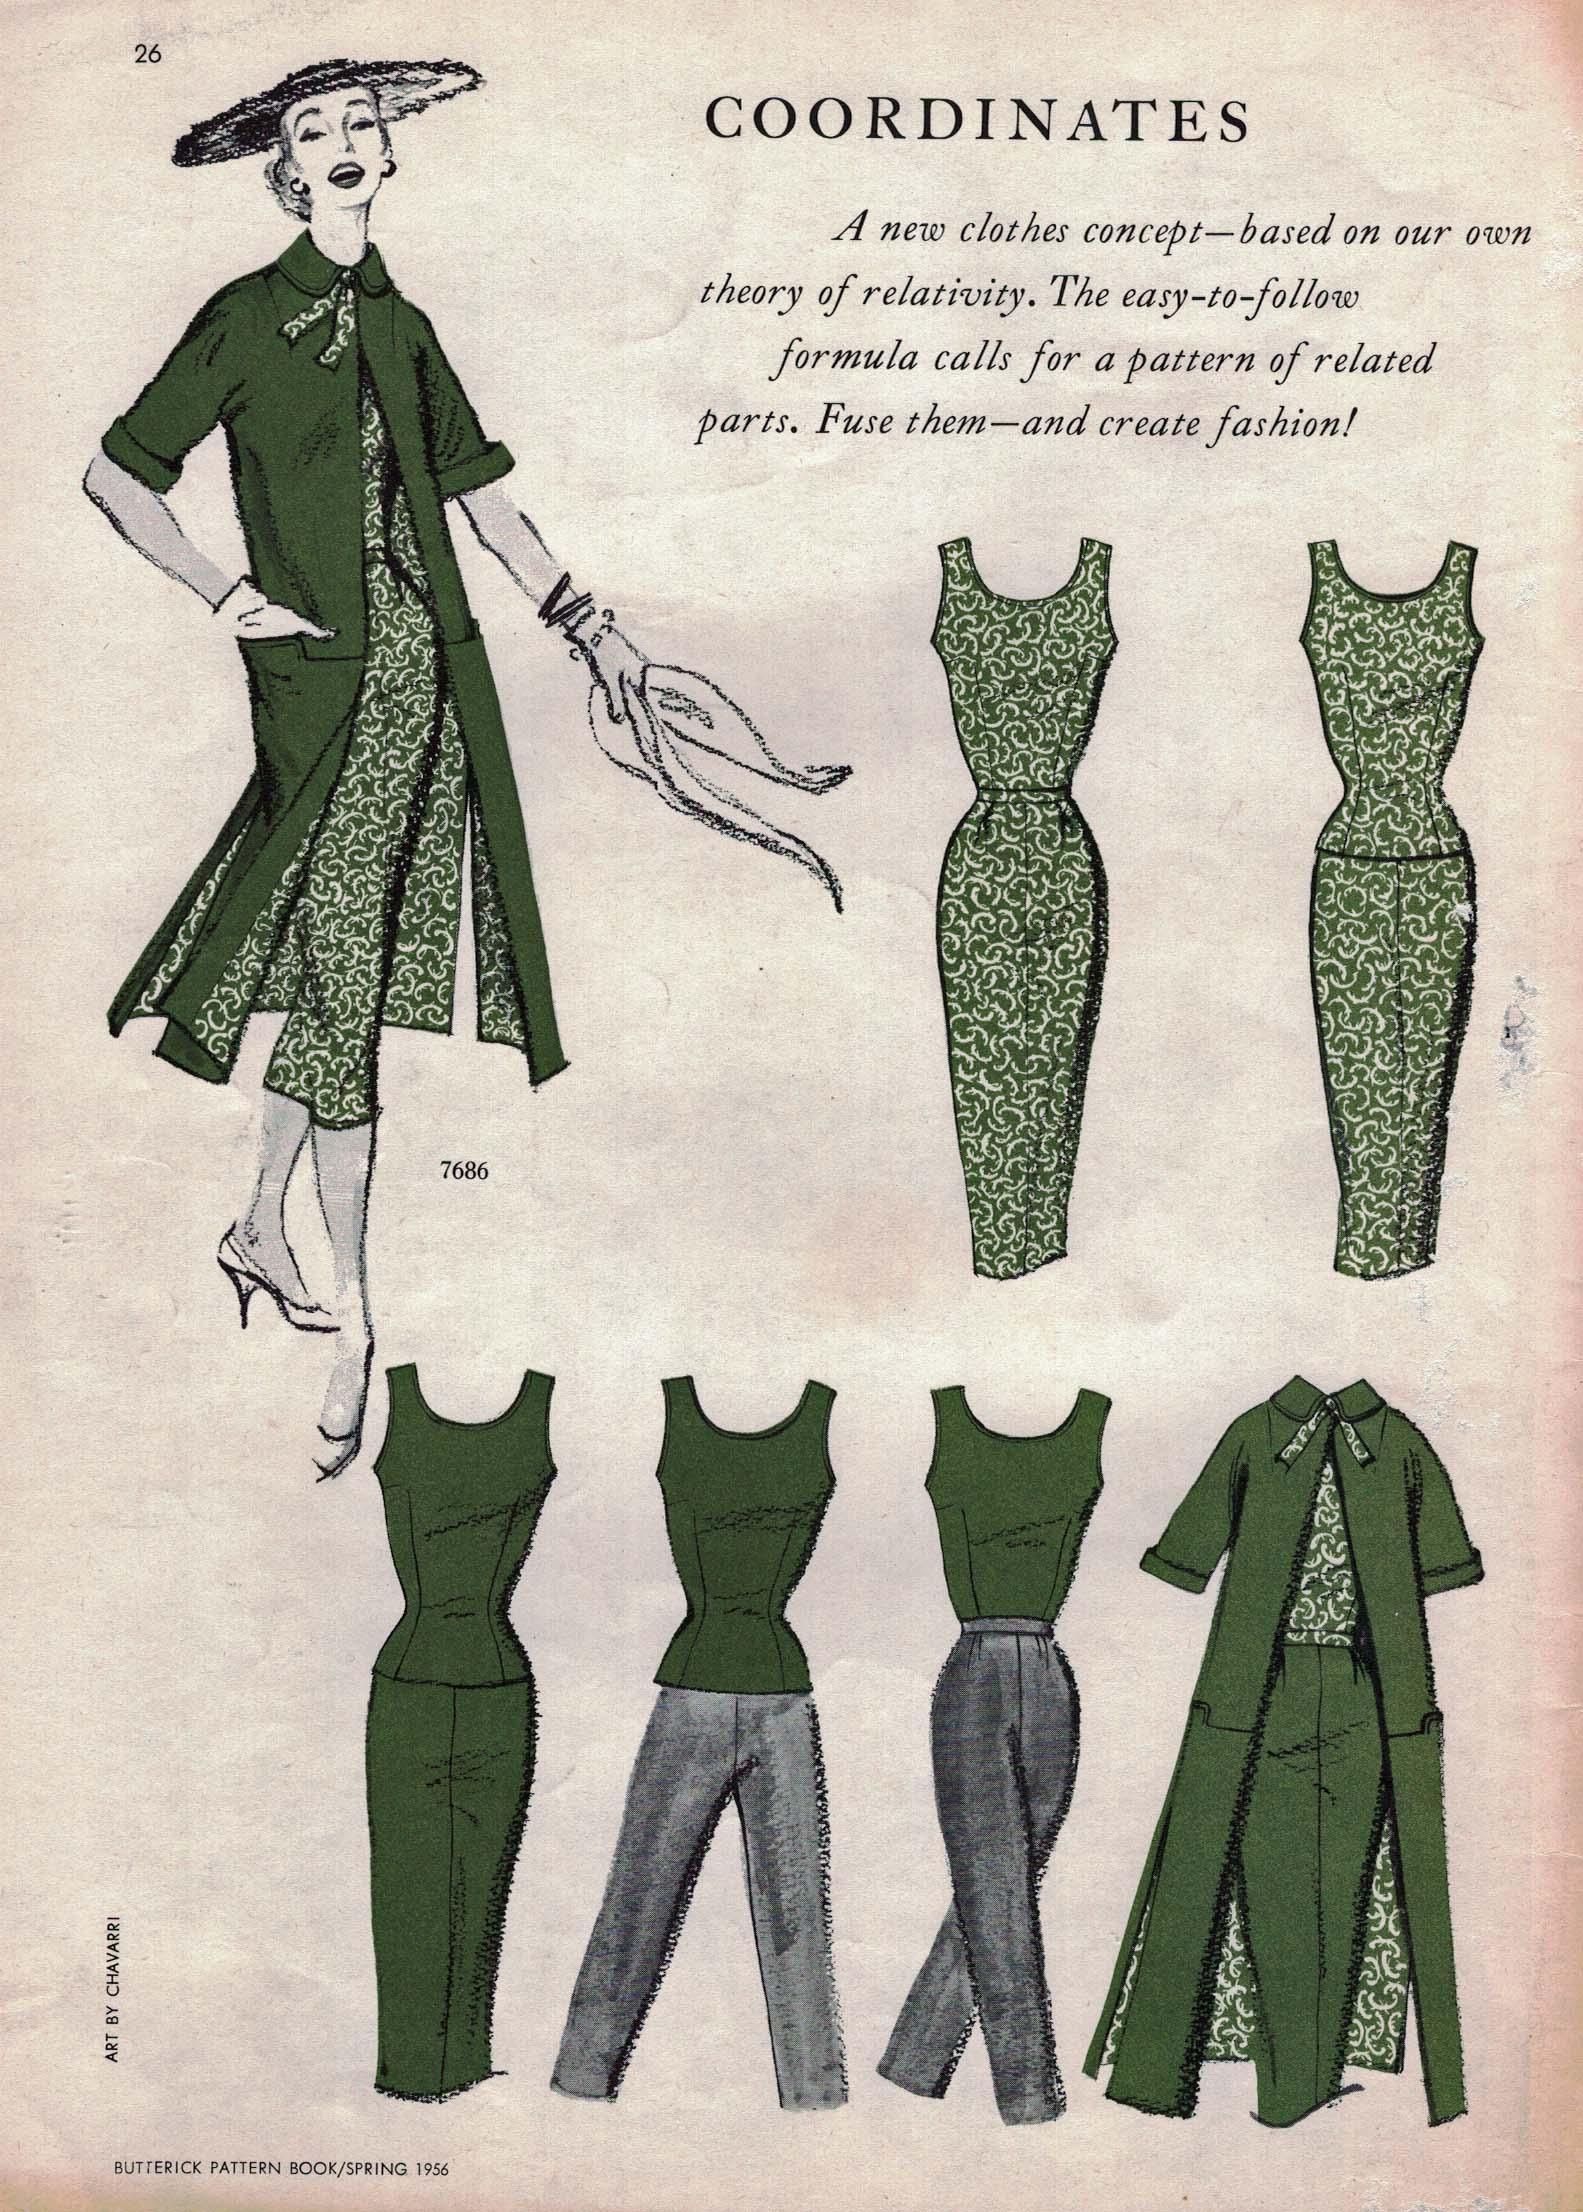 Butterick Pattern Book, Spring 1956